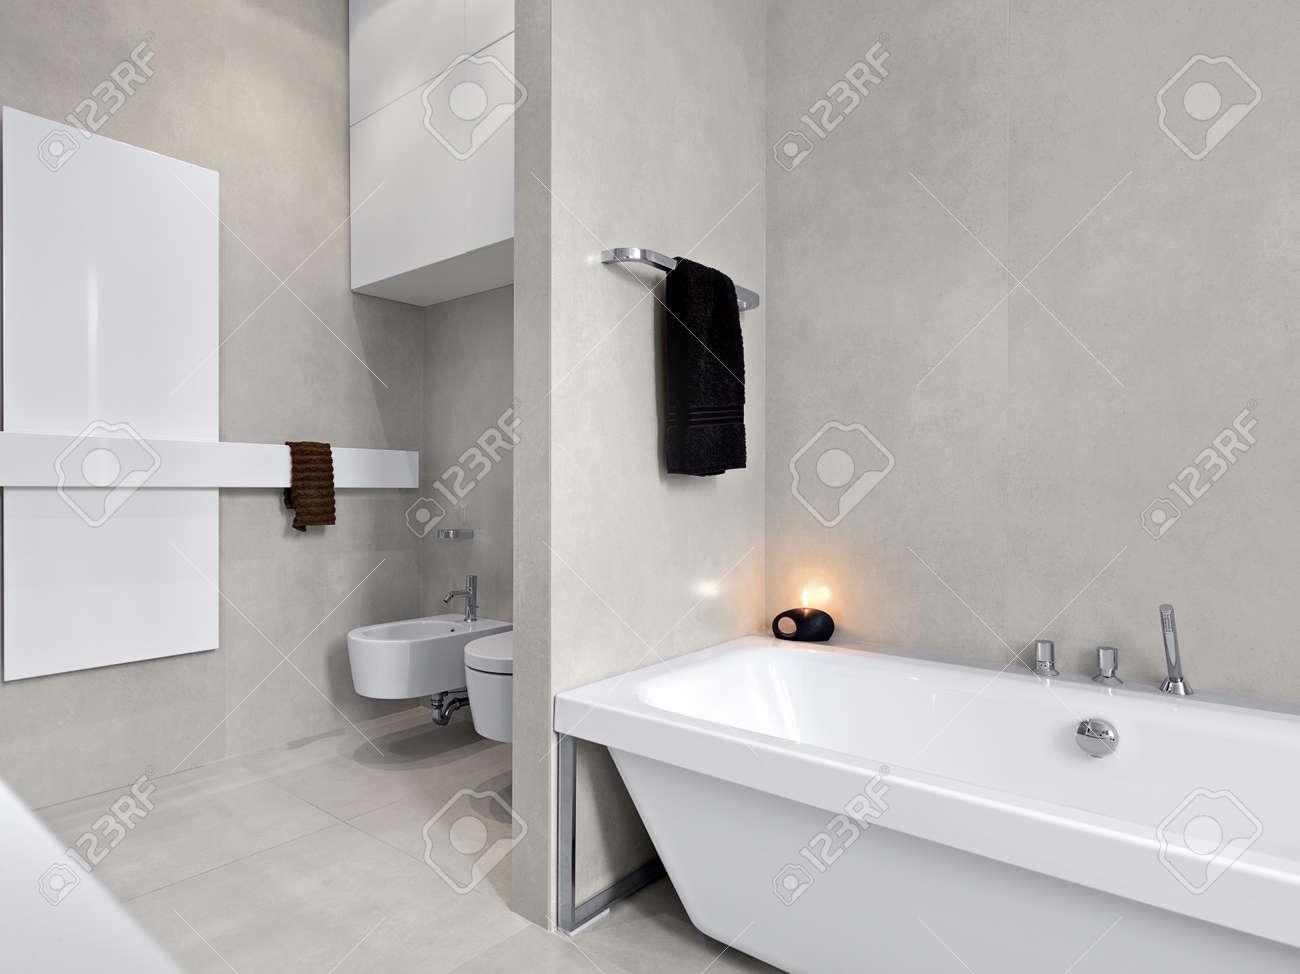 Moderna badkar i ett modernt badrum med utsikt på sanitetsporslin ...